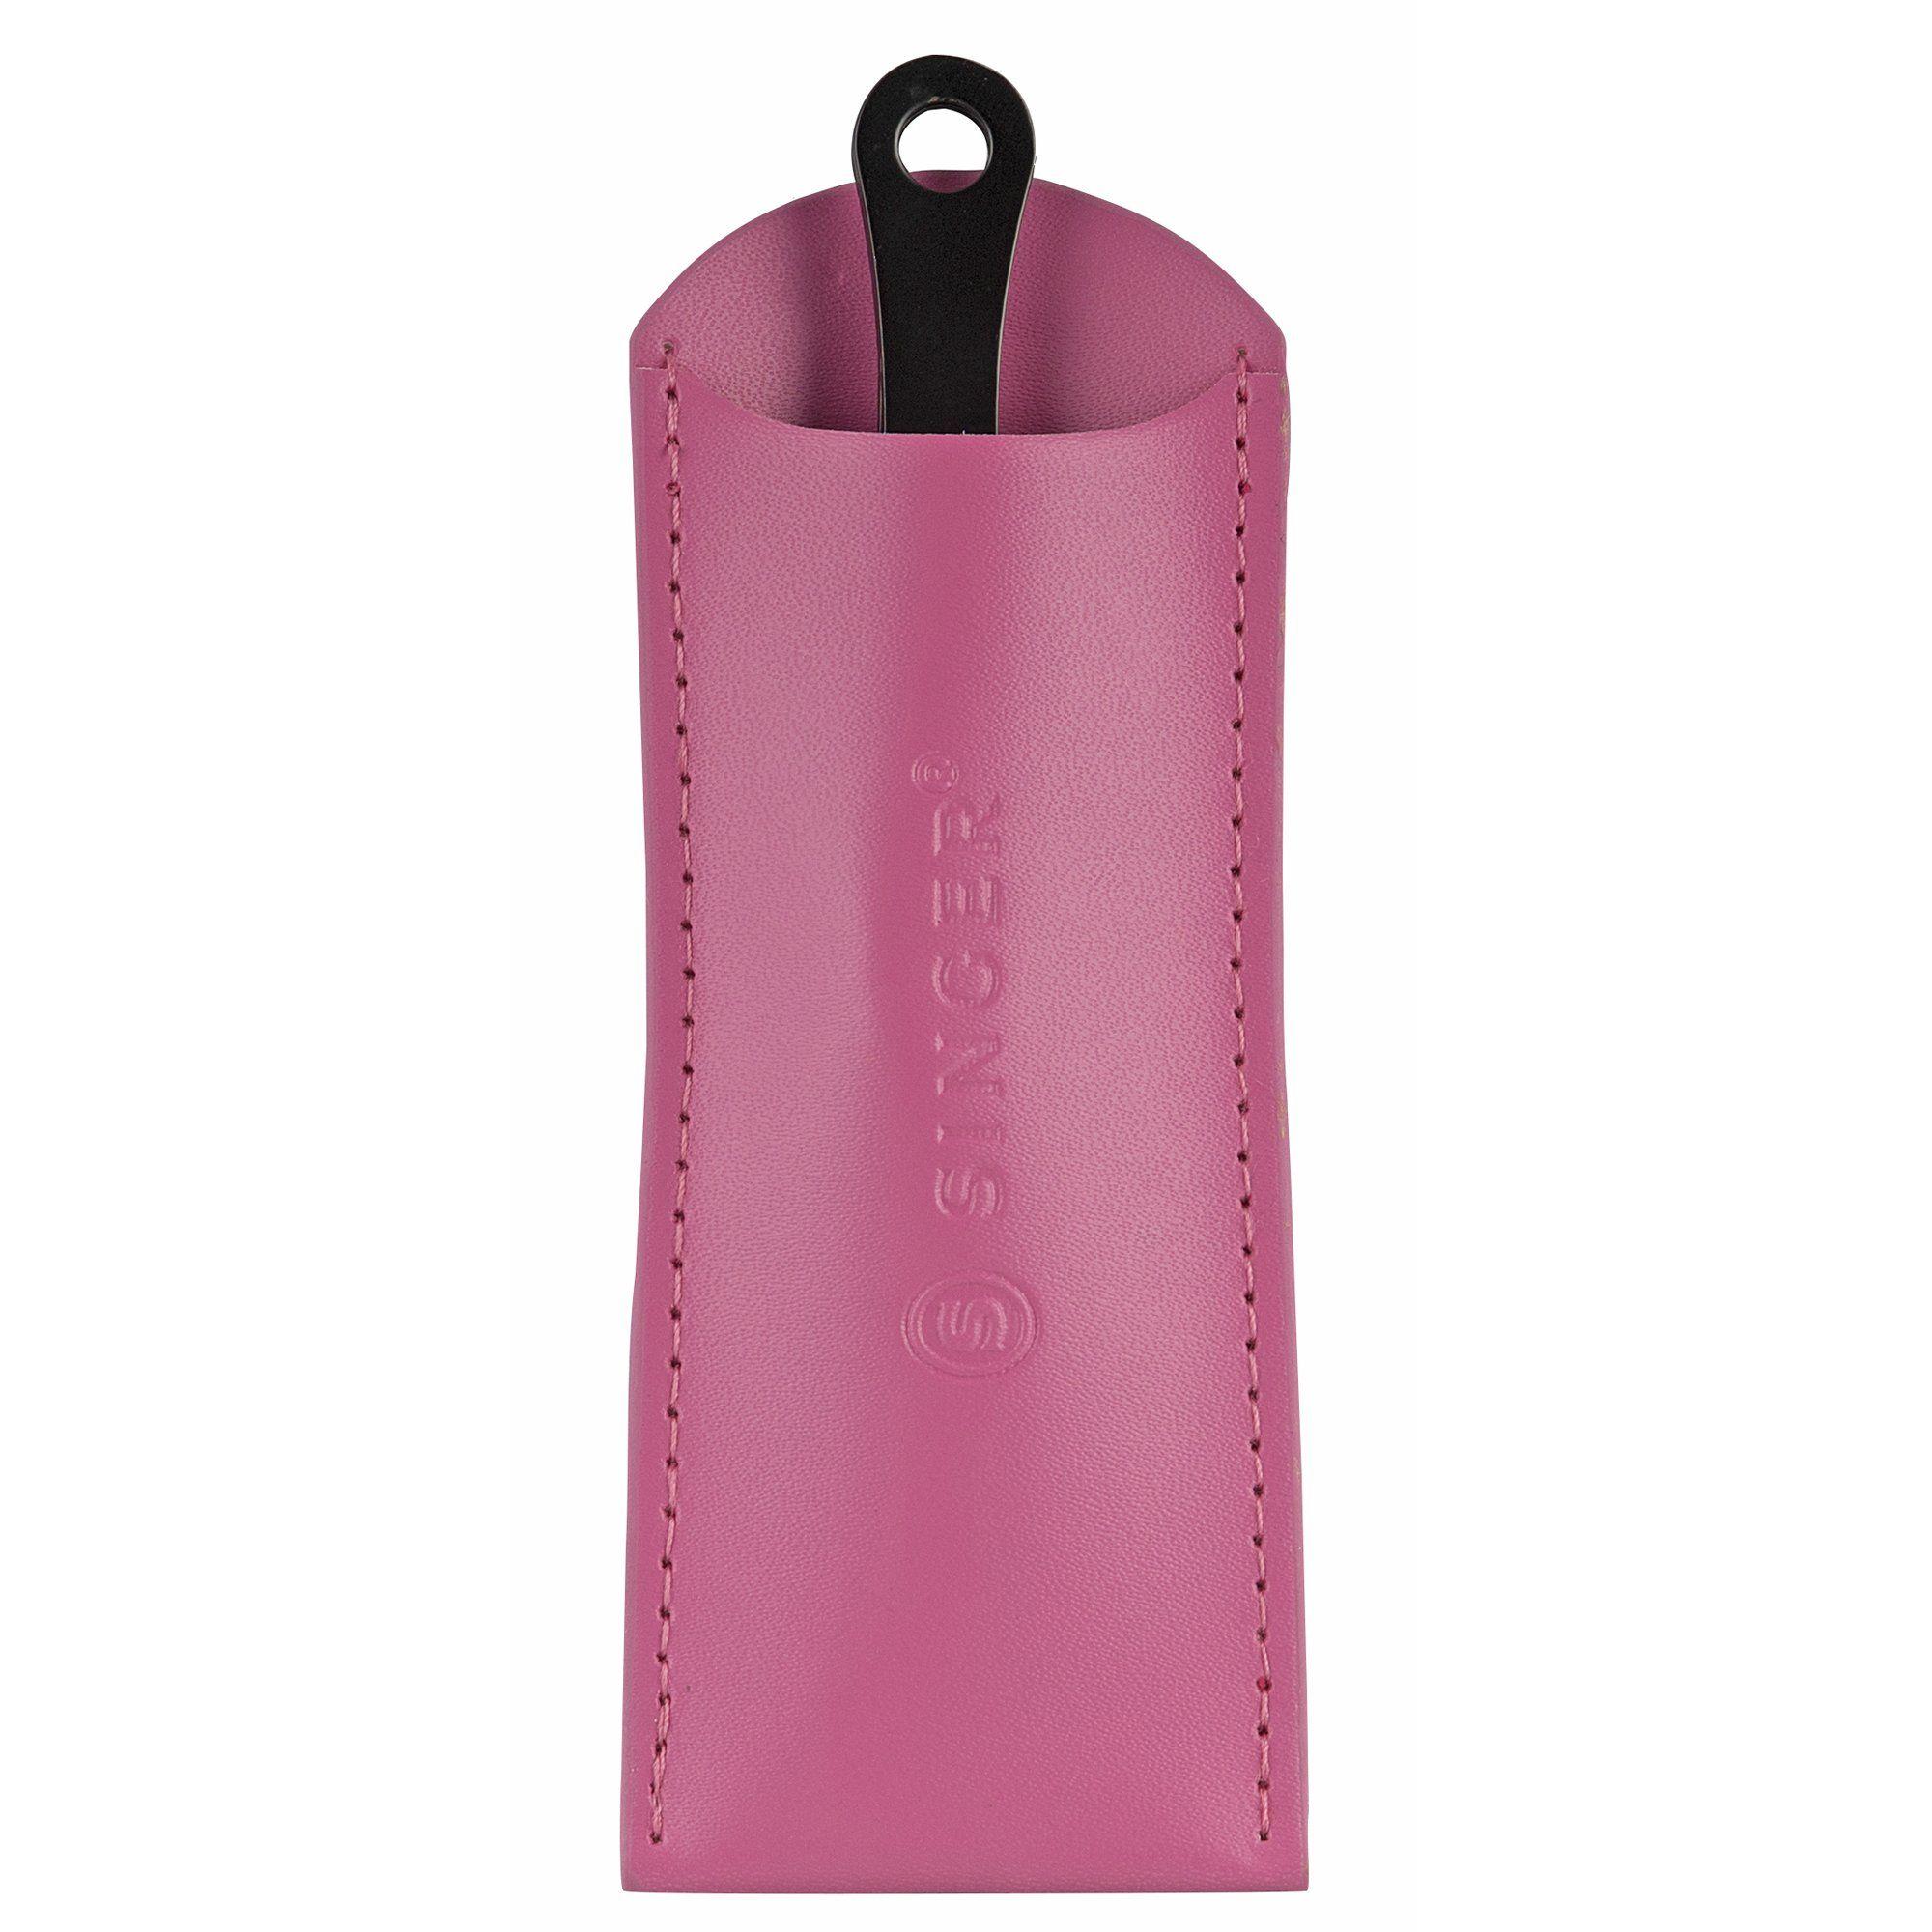 SINGER 50024 ProSeries Self-Locking Tweezer with Storage Sleeve